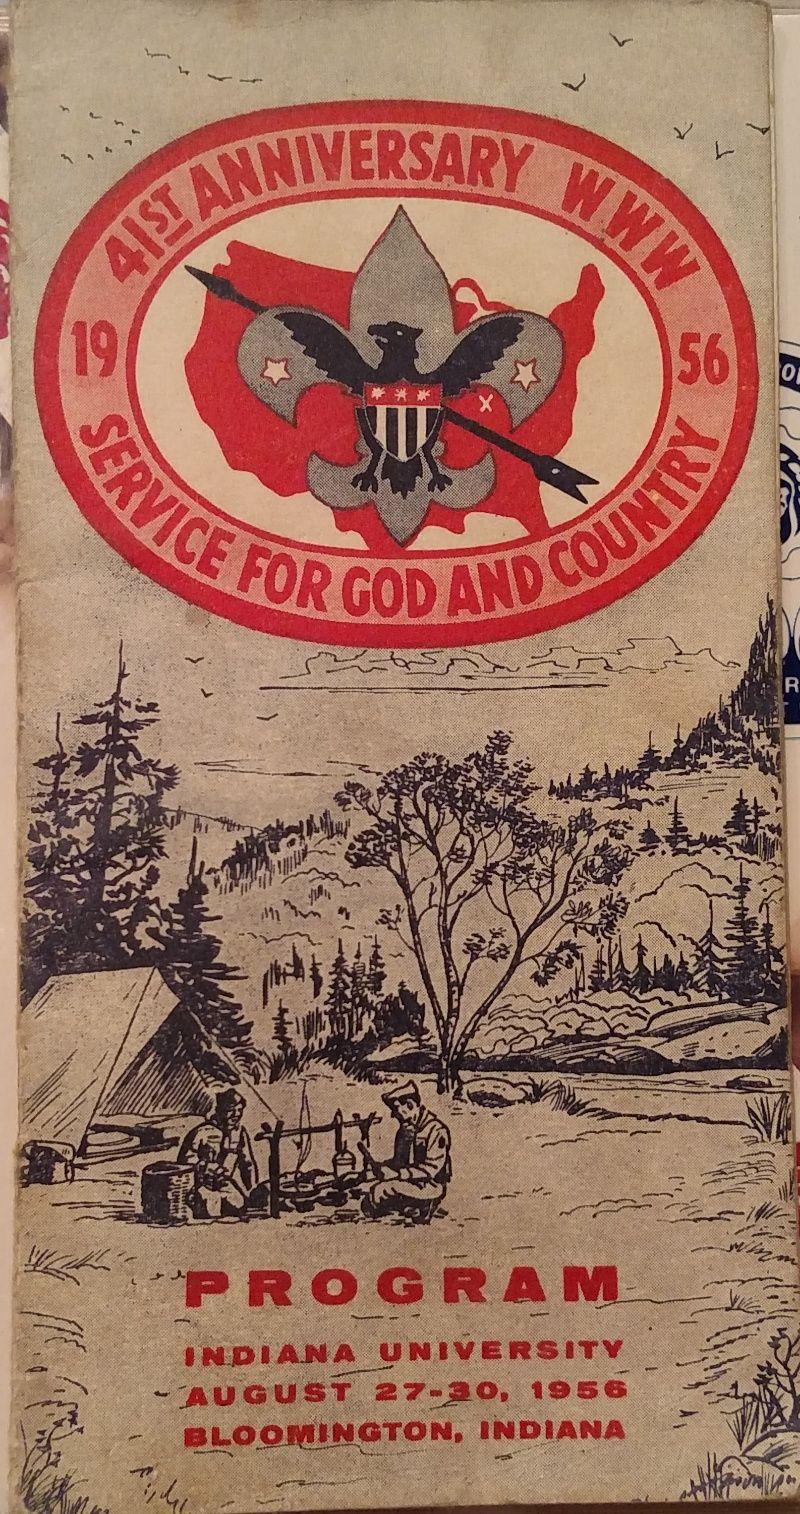 Scouter_Jeff 1956 NOAC Program Order of the arrow